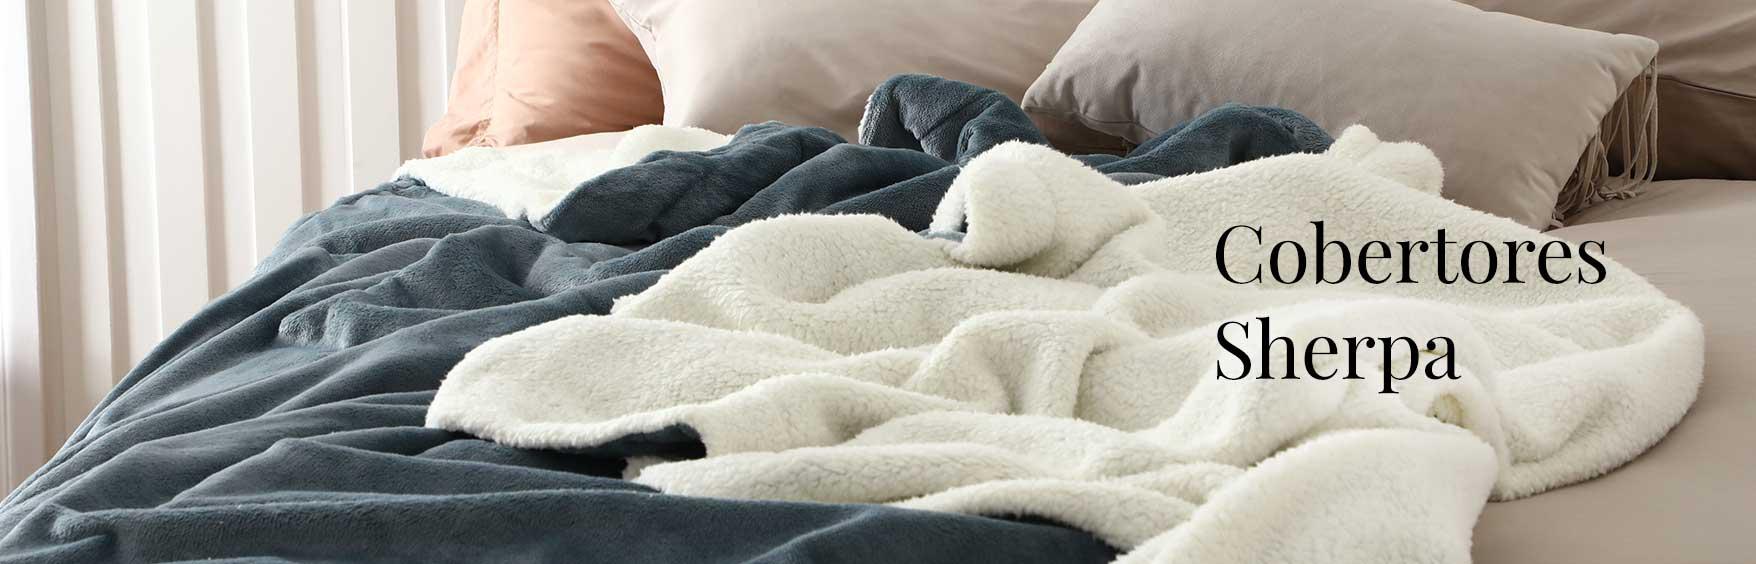 <Cobertores Sherpa | WestwingNow>